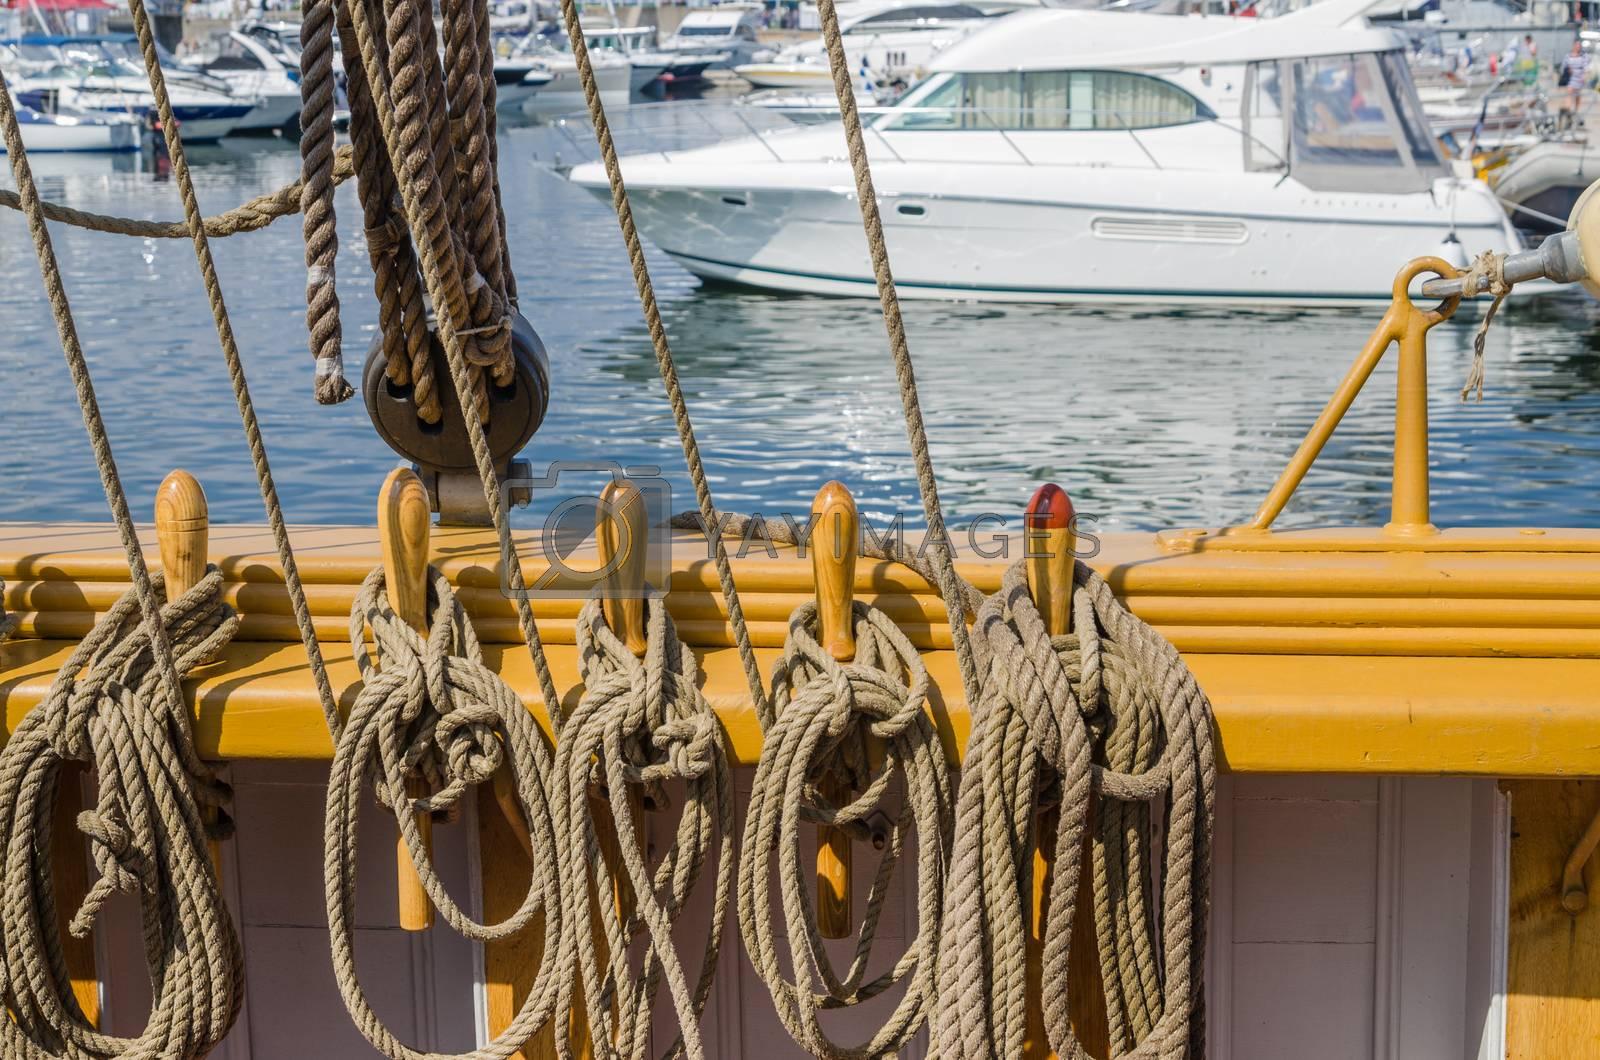 Blocks and tackles of a sailing vessel